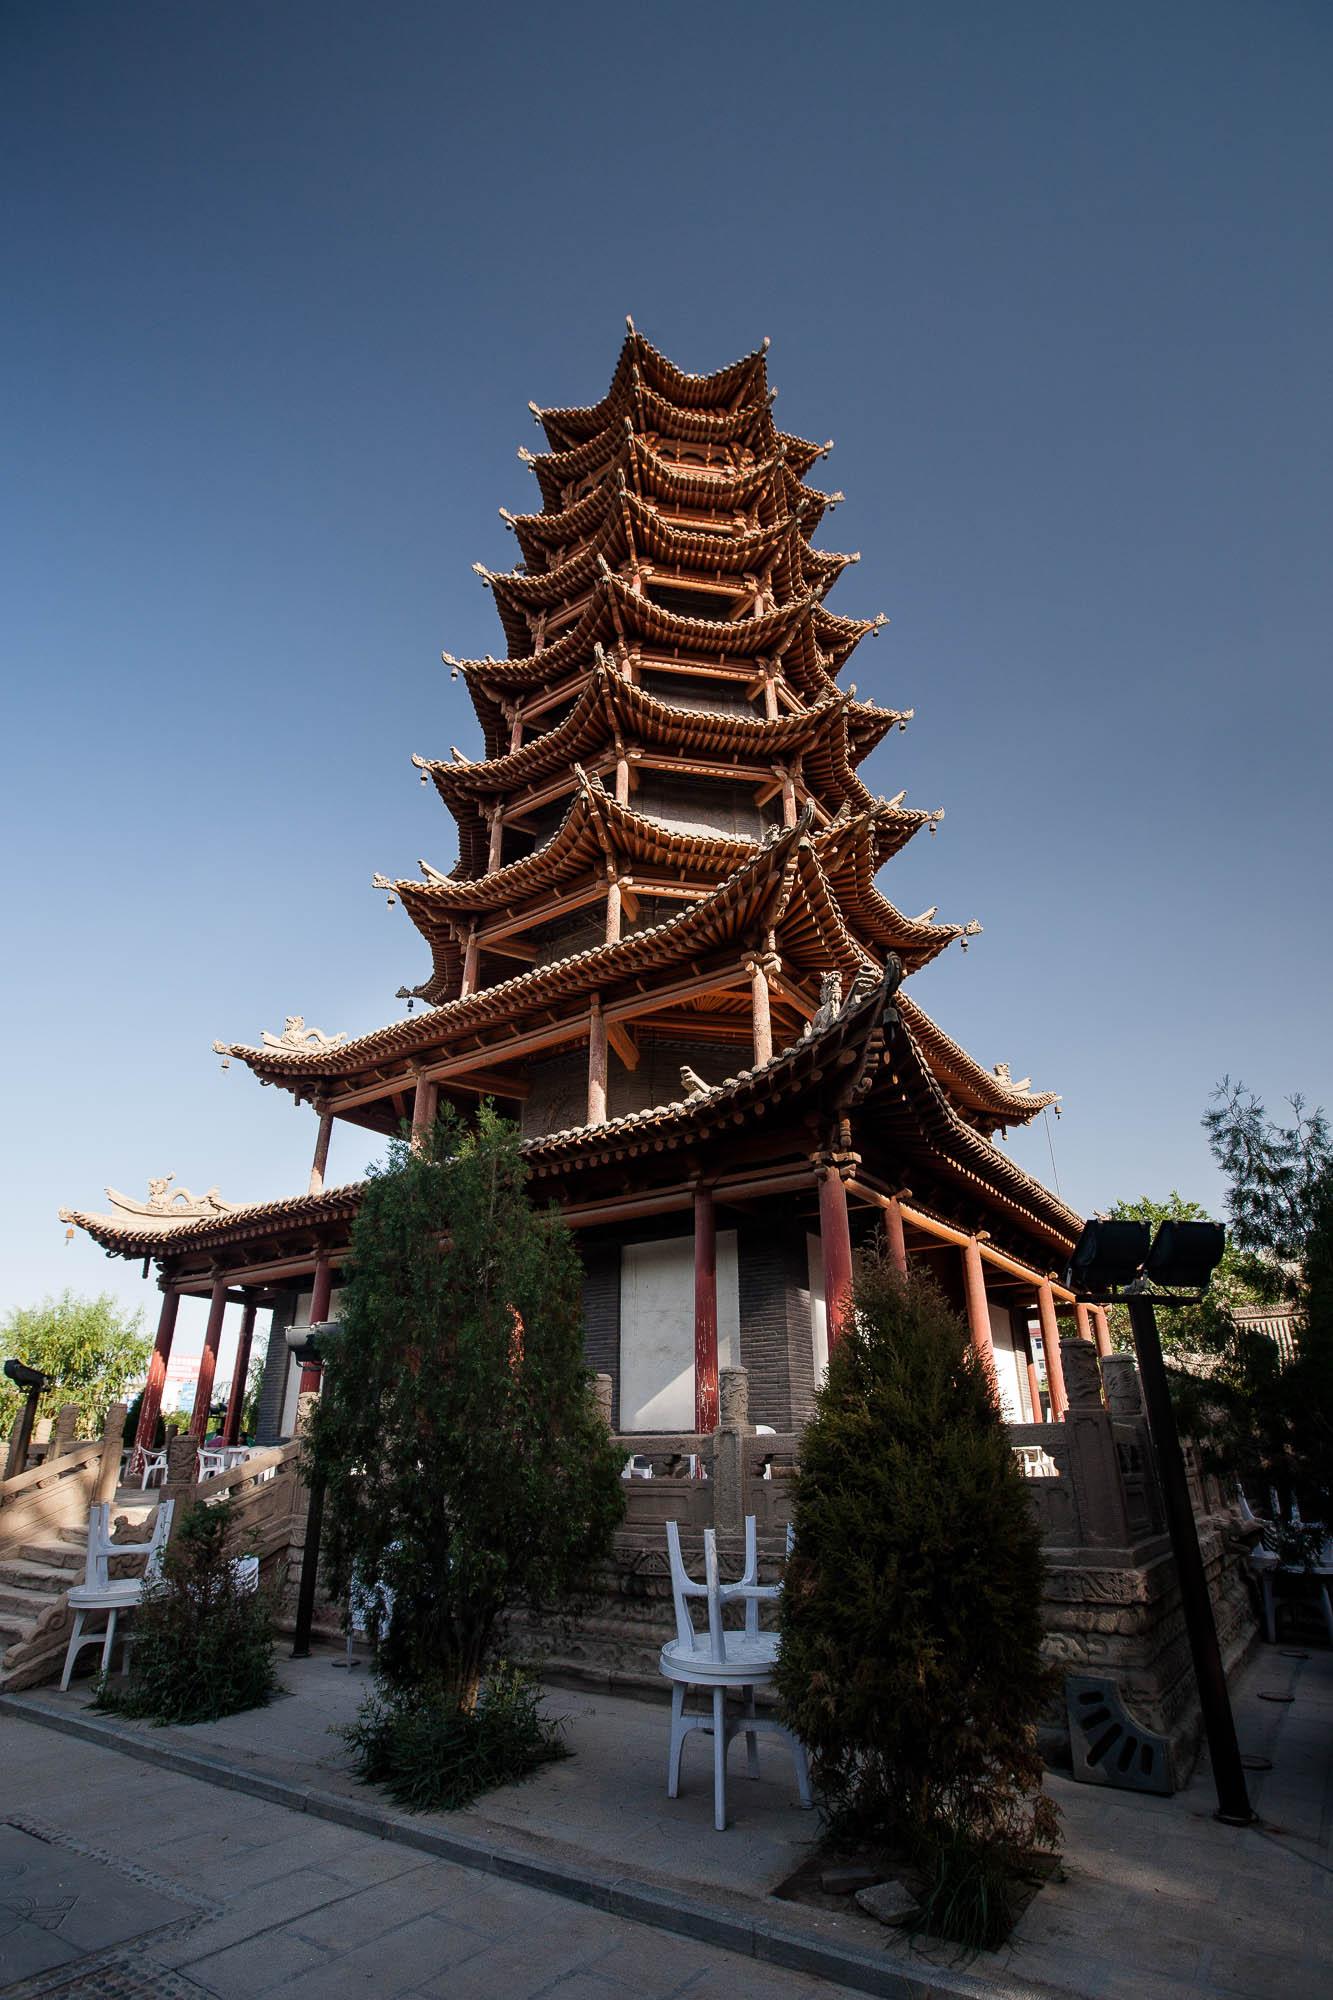 Wooden Pagoda